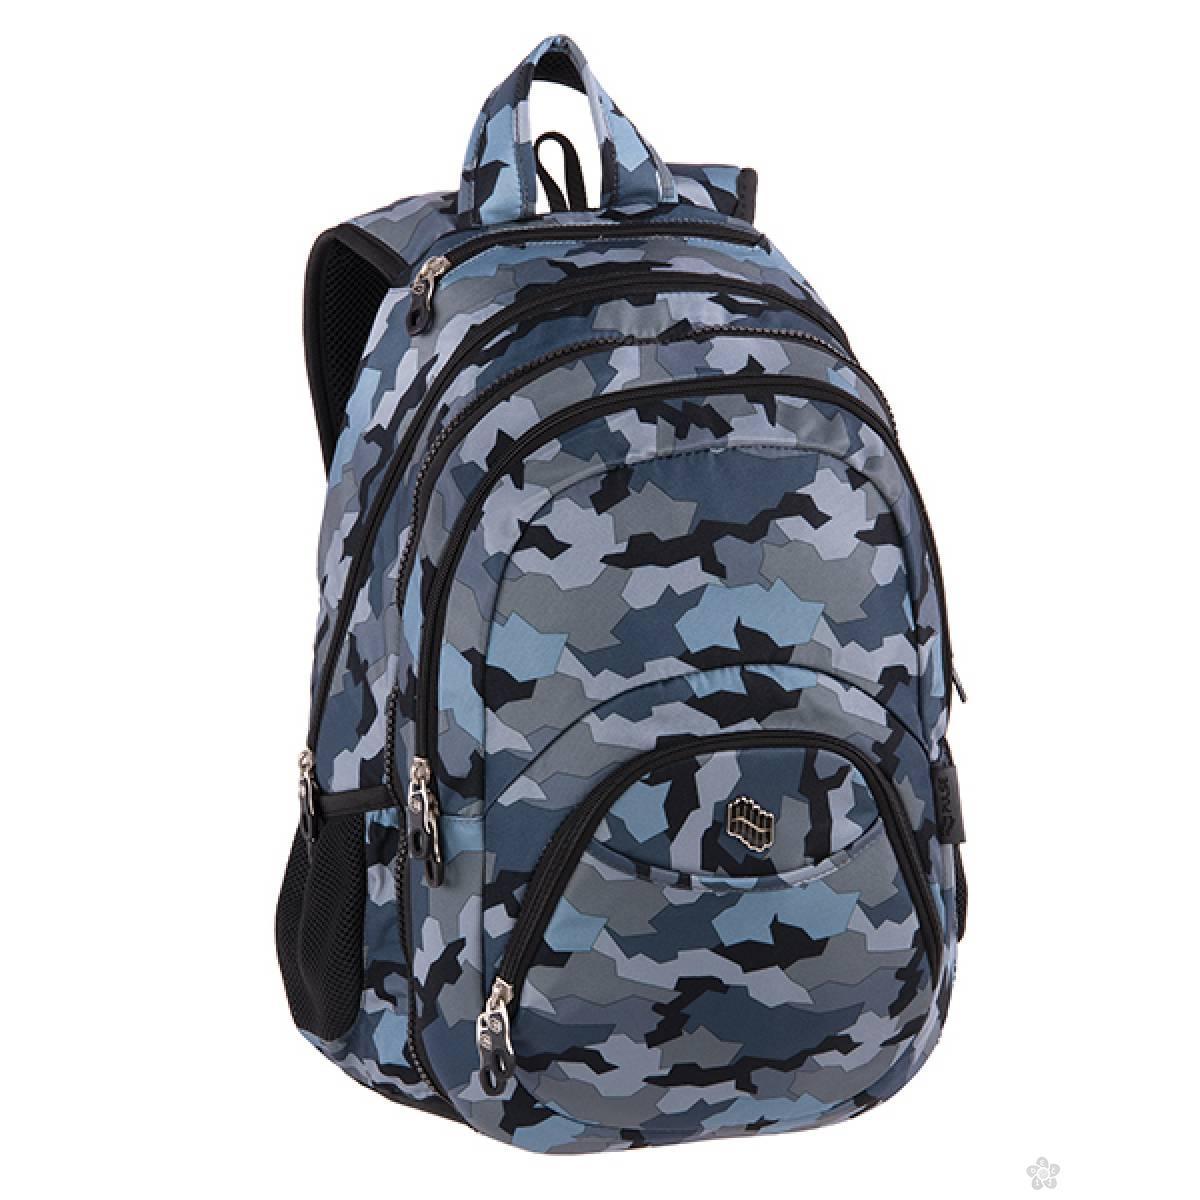 Ranac 2 u 1 Teens Gray Army 121797